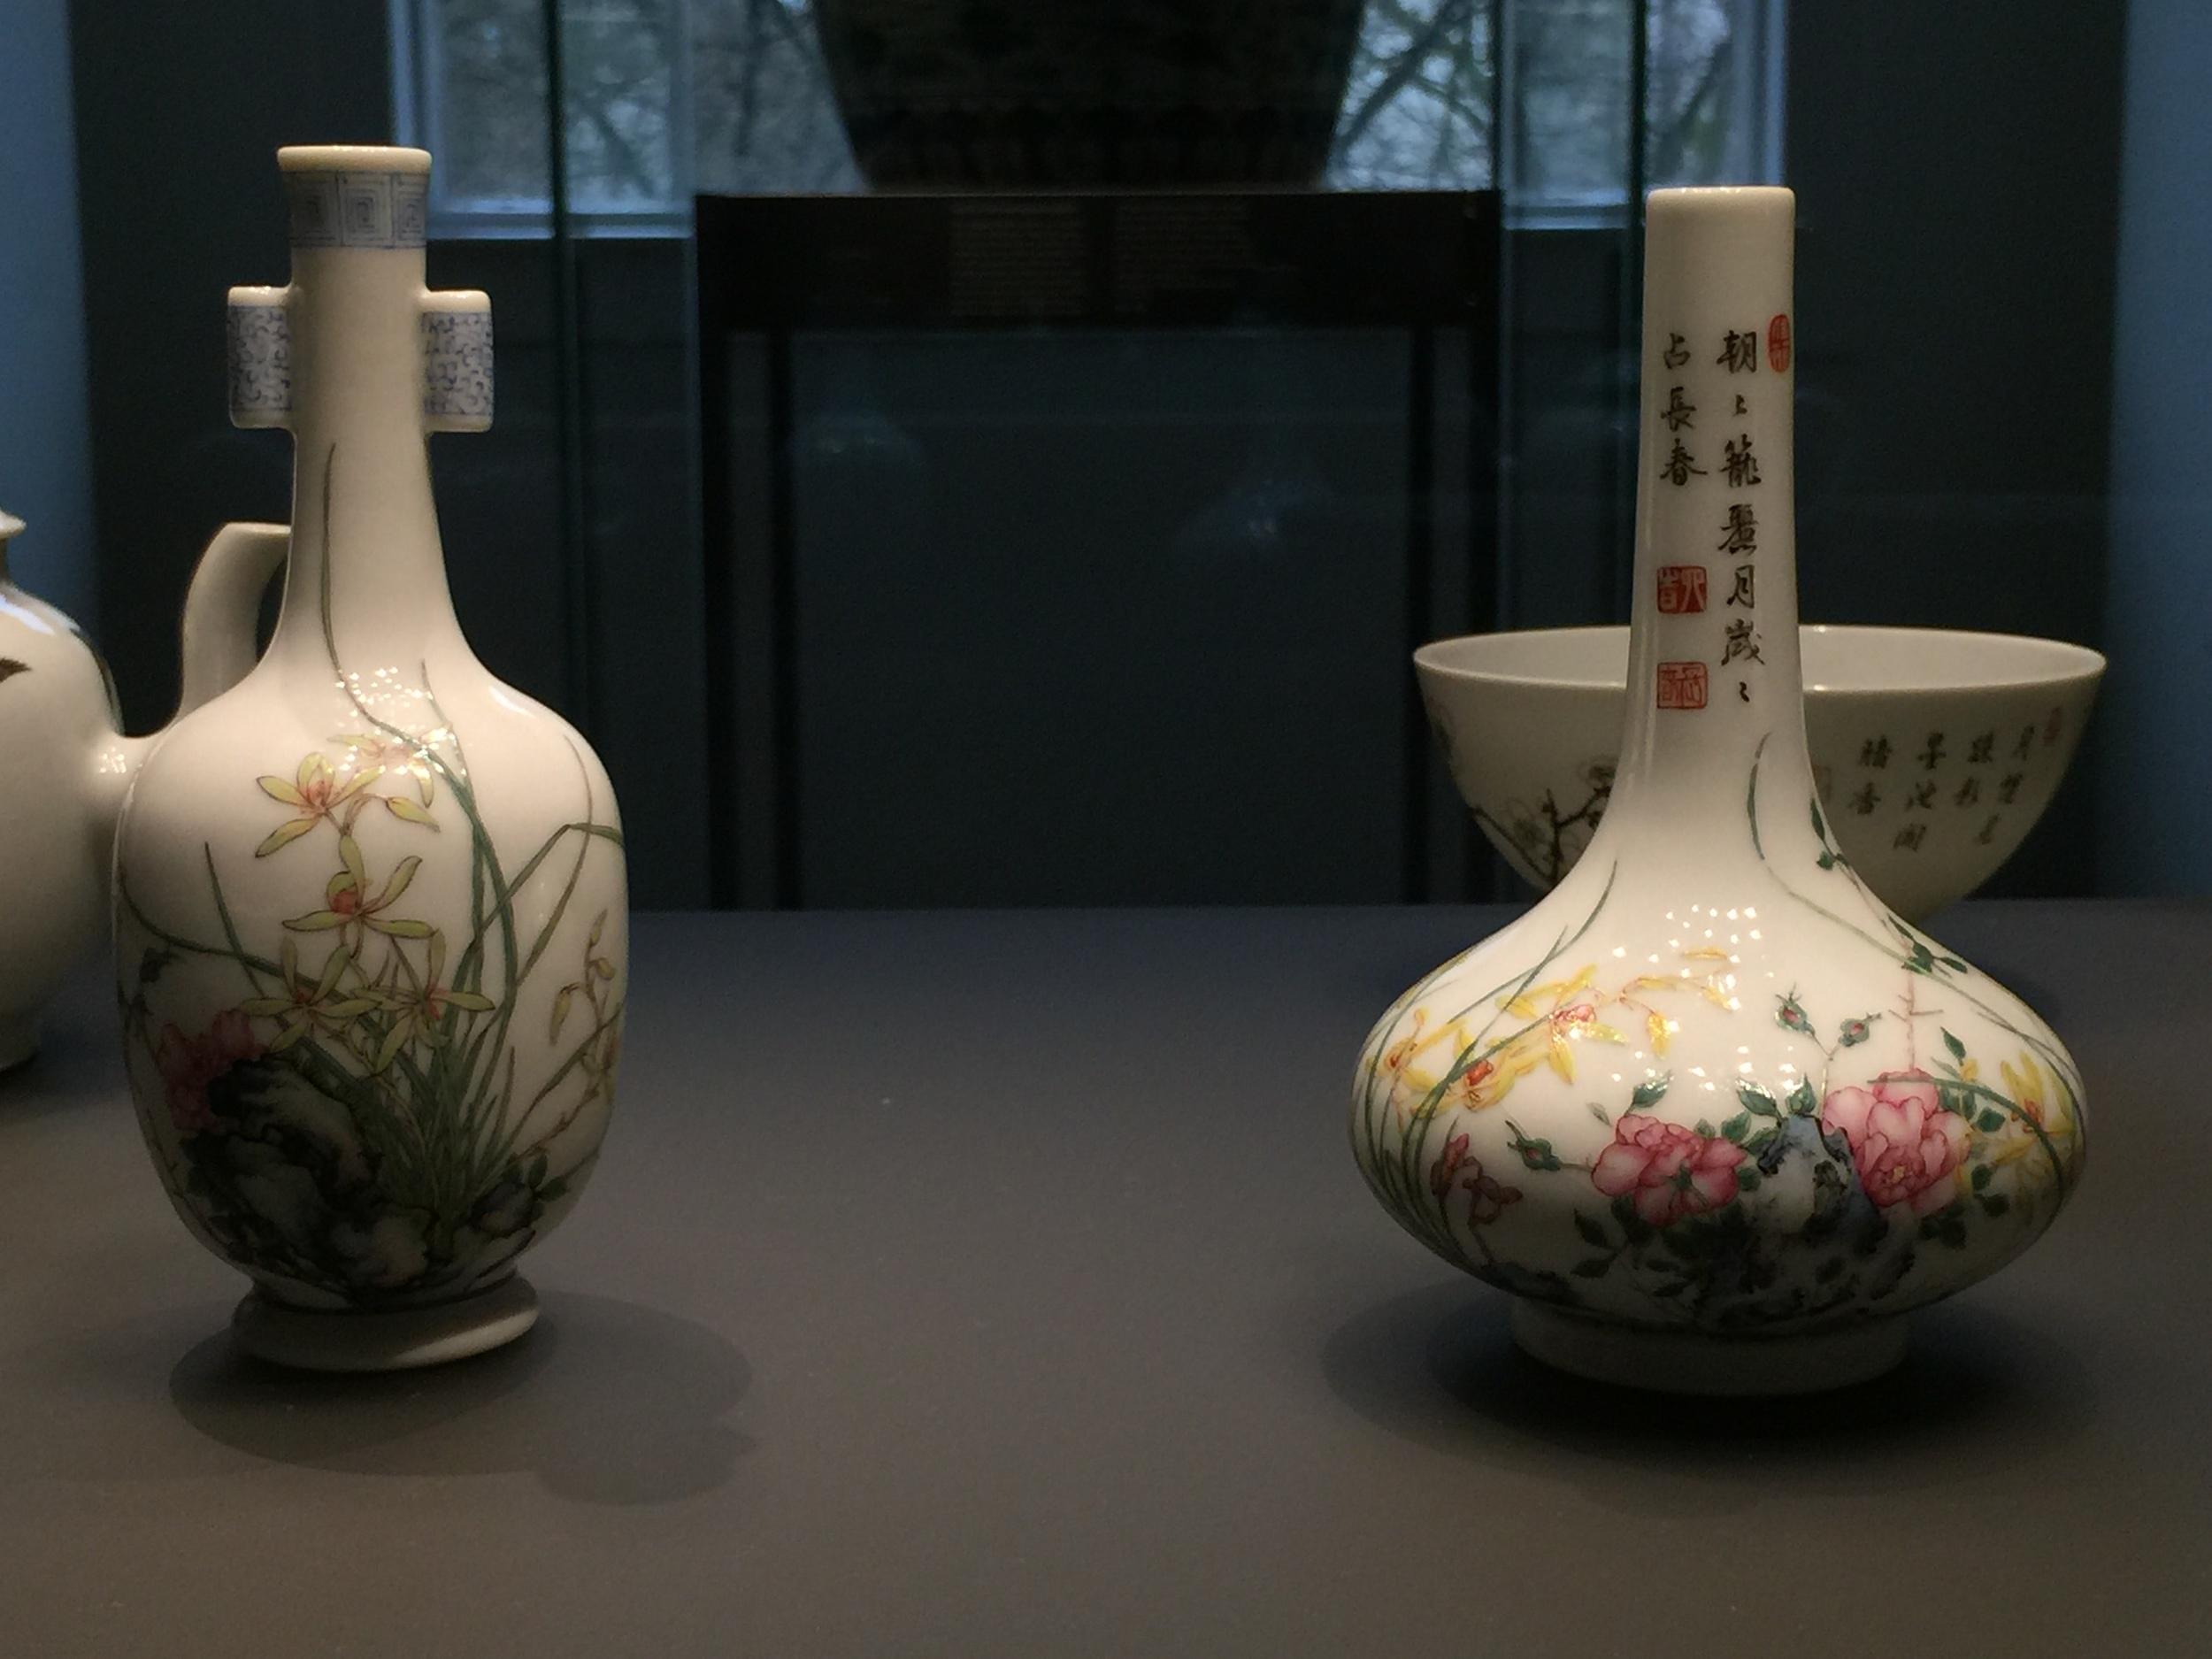 Chinese-Porcelain-British-Museum-Percival-David-jessewaugh.com-94.jpg